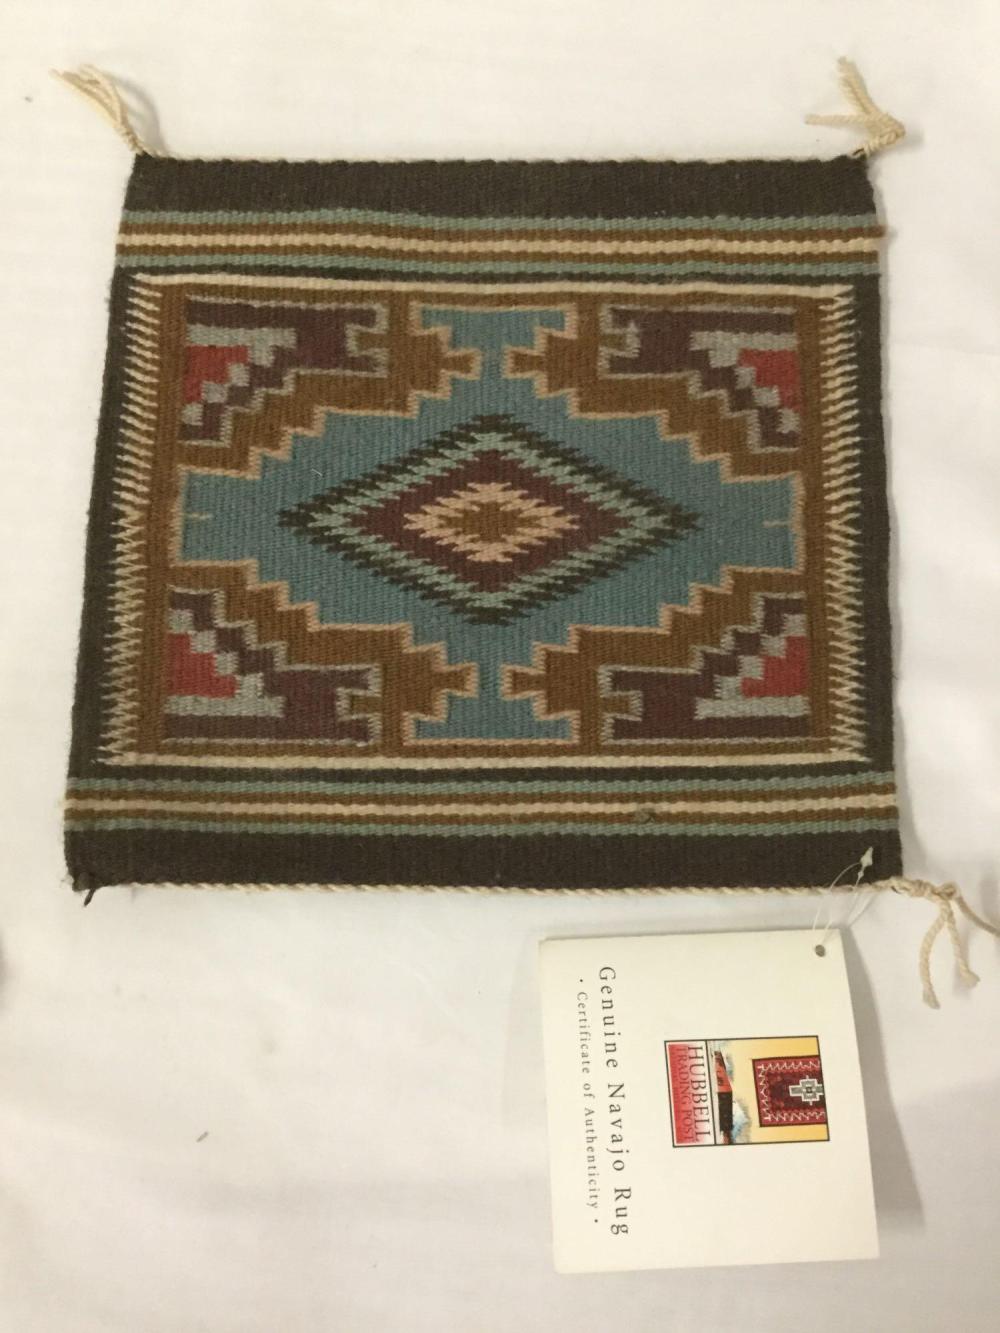 Lot 316: 2 Native American dream catcher & Genuine Navajo Rug by Delora VanWinkle w/COA